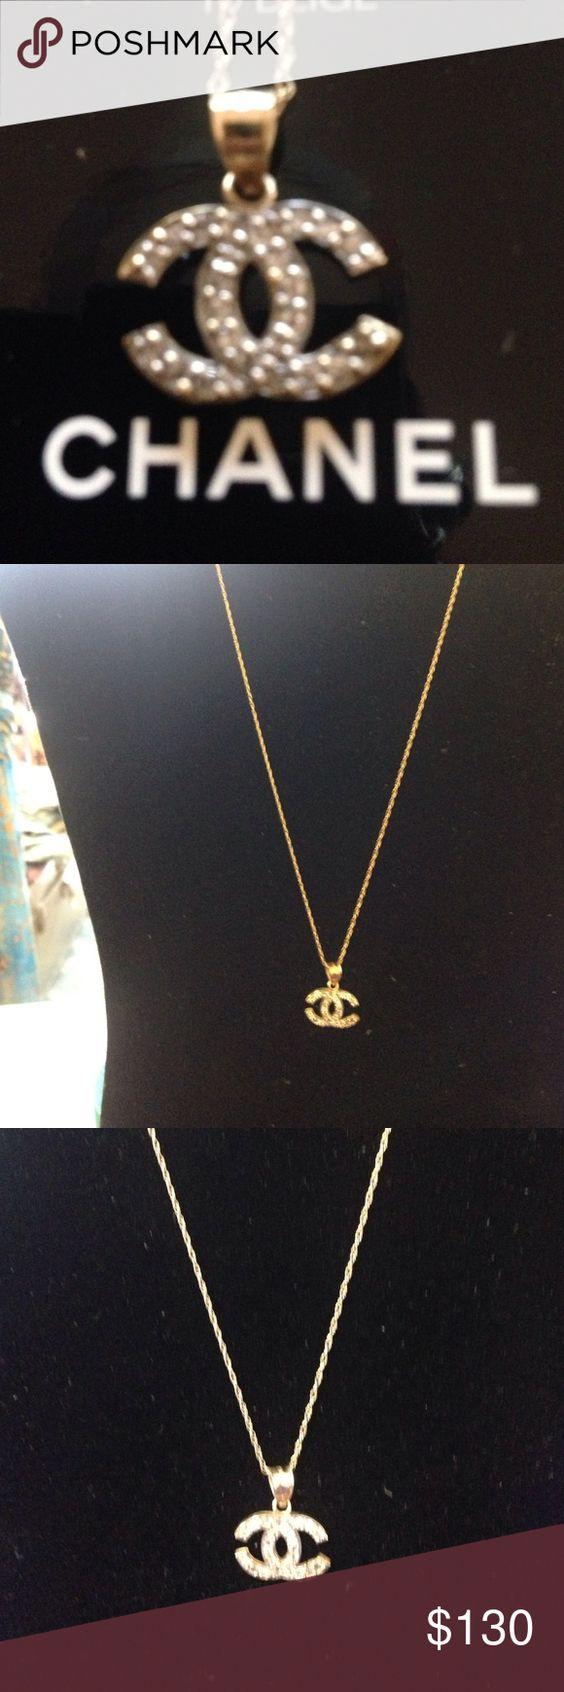 10 k  Chanel gold necklace crystal 10k crystal gold Chanel necklace CHANEL Jewelry Necklaces